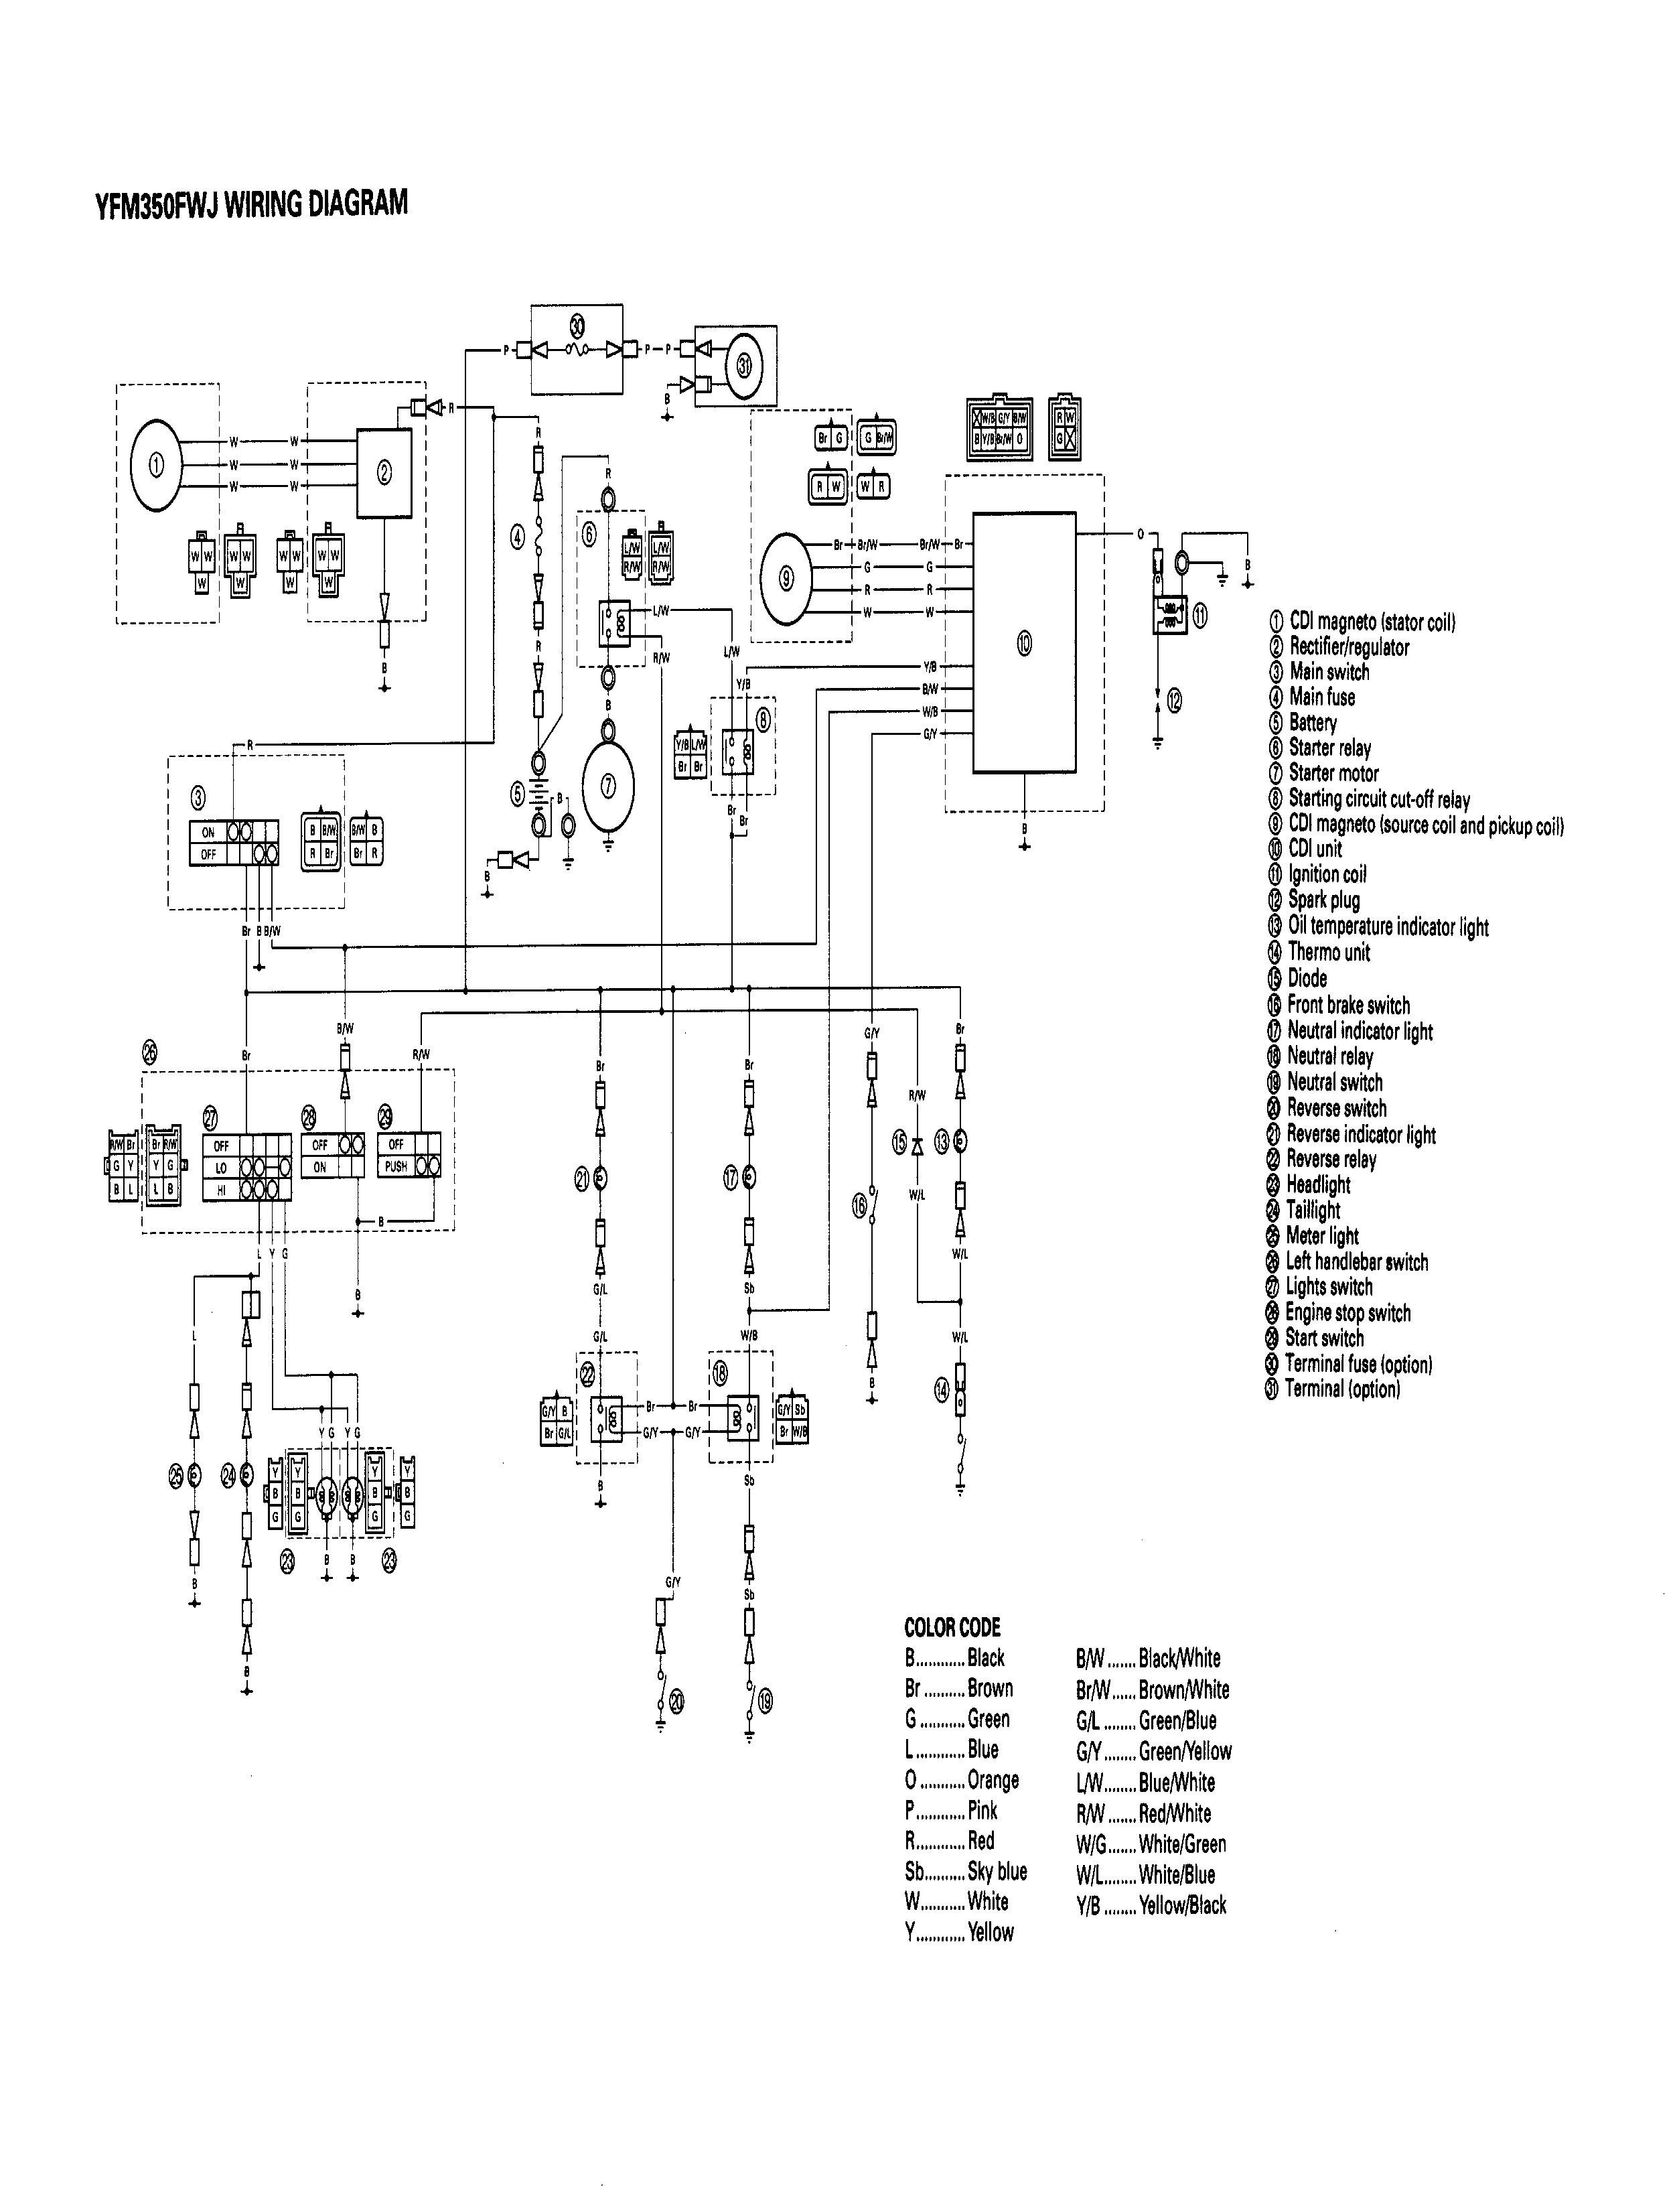 Will A Yamaha Kodiak 450 Wiring Harness Work On A 400 Yamaha Warrior 350 Wiring Specs Wiring Diagram Schematic